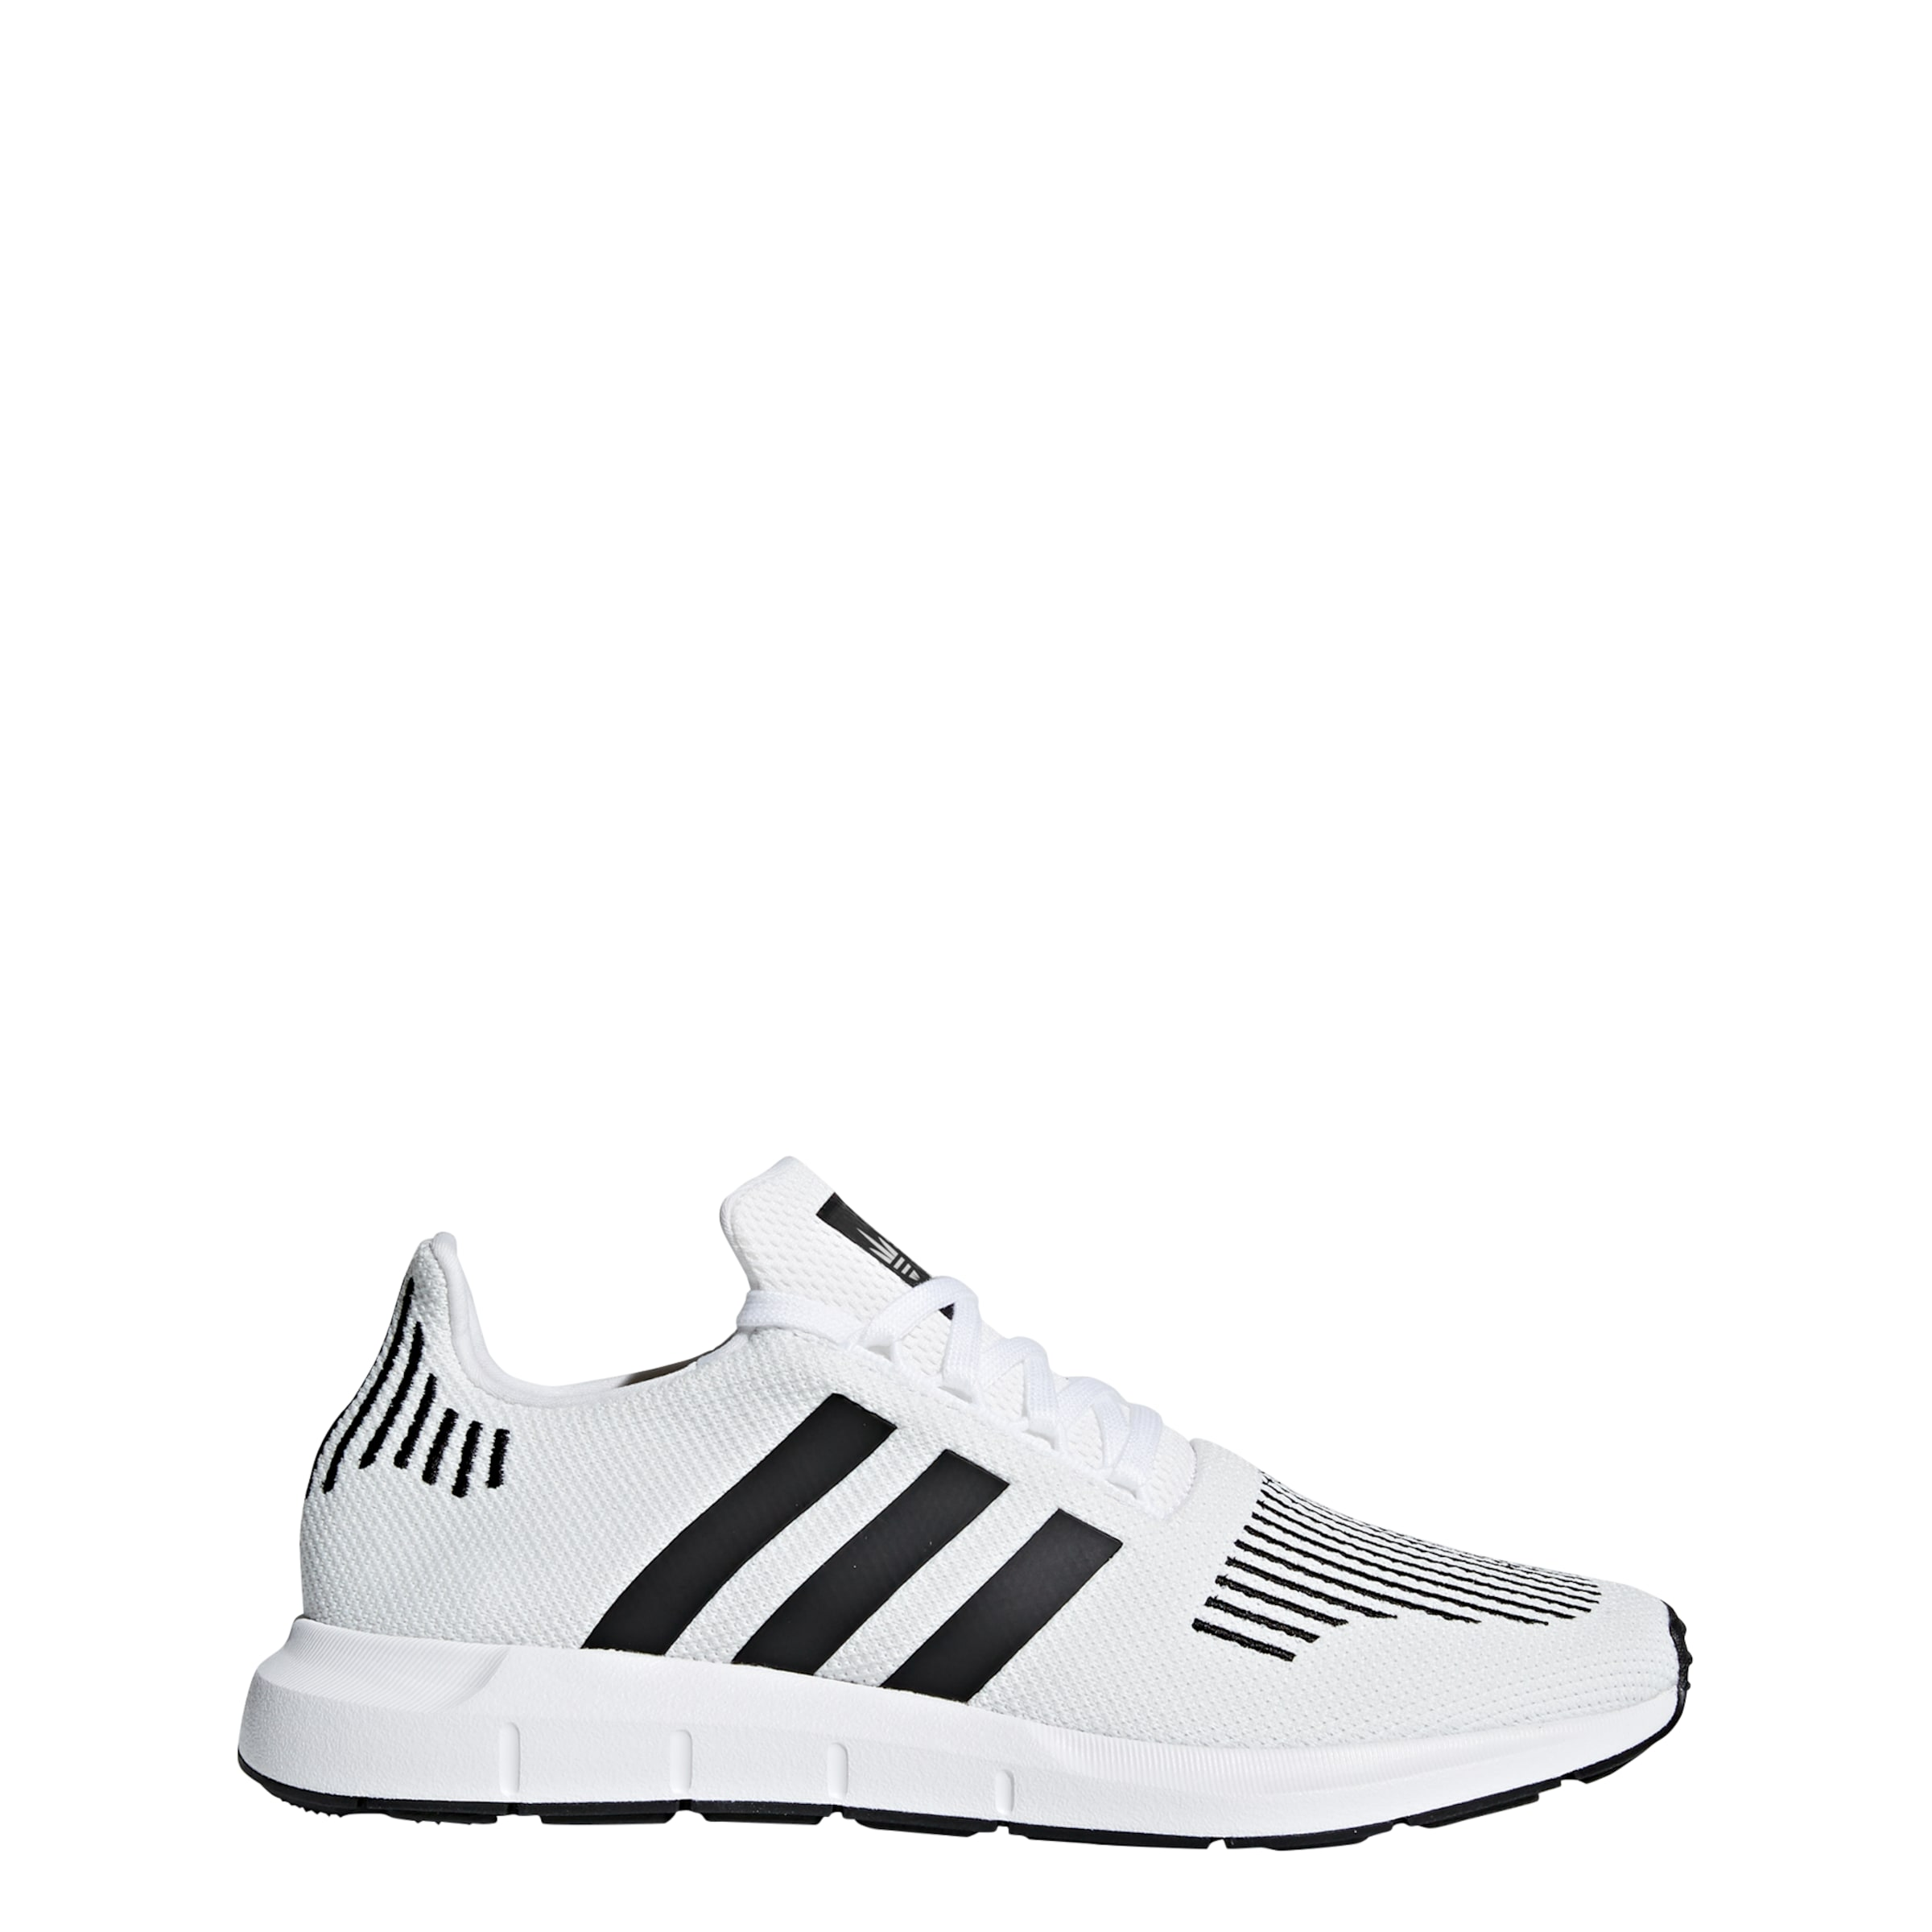 Adidas Hoog Originals Run' 'swift In Sneakers SchwarzWeiß Ybf6gy7